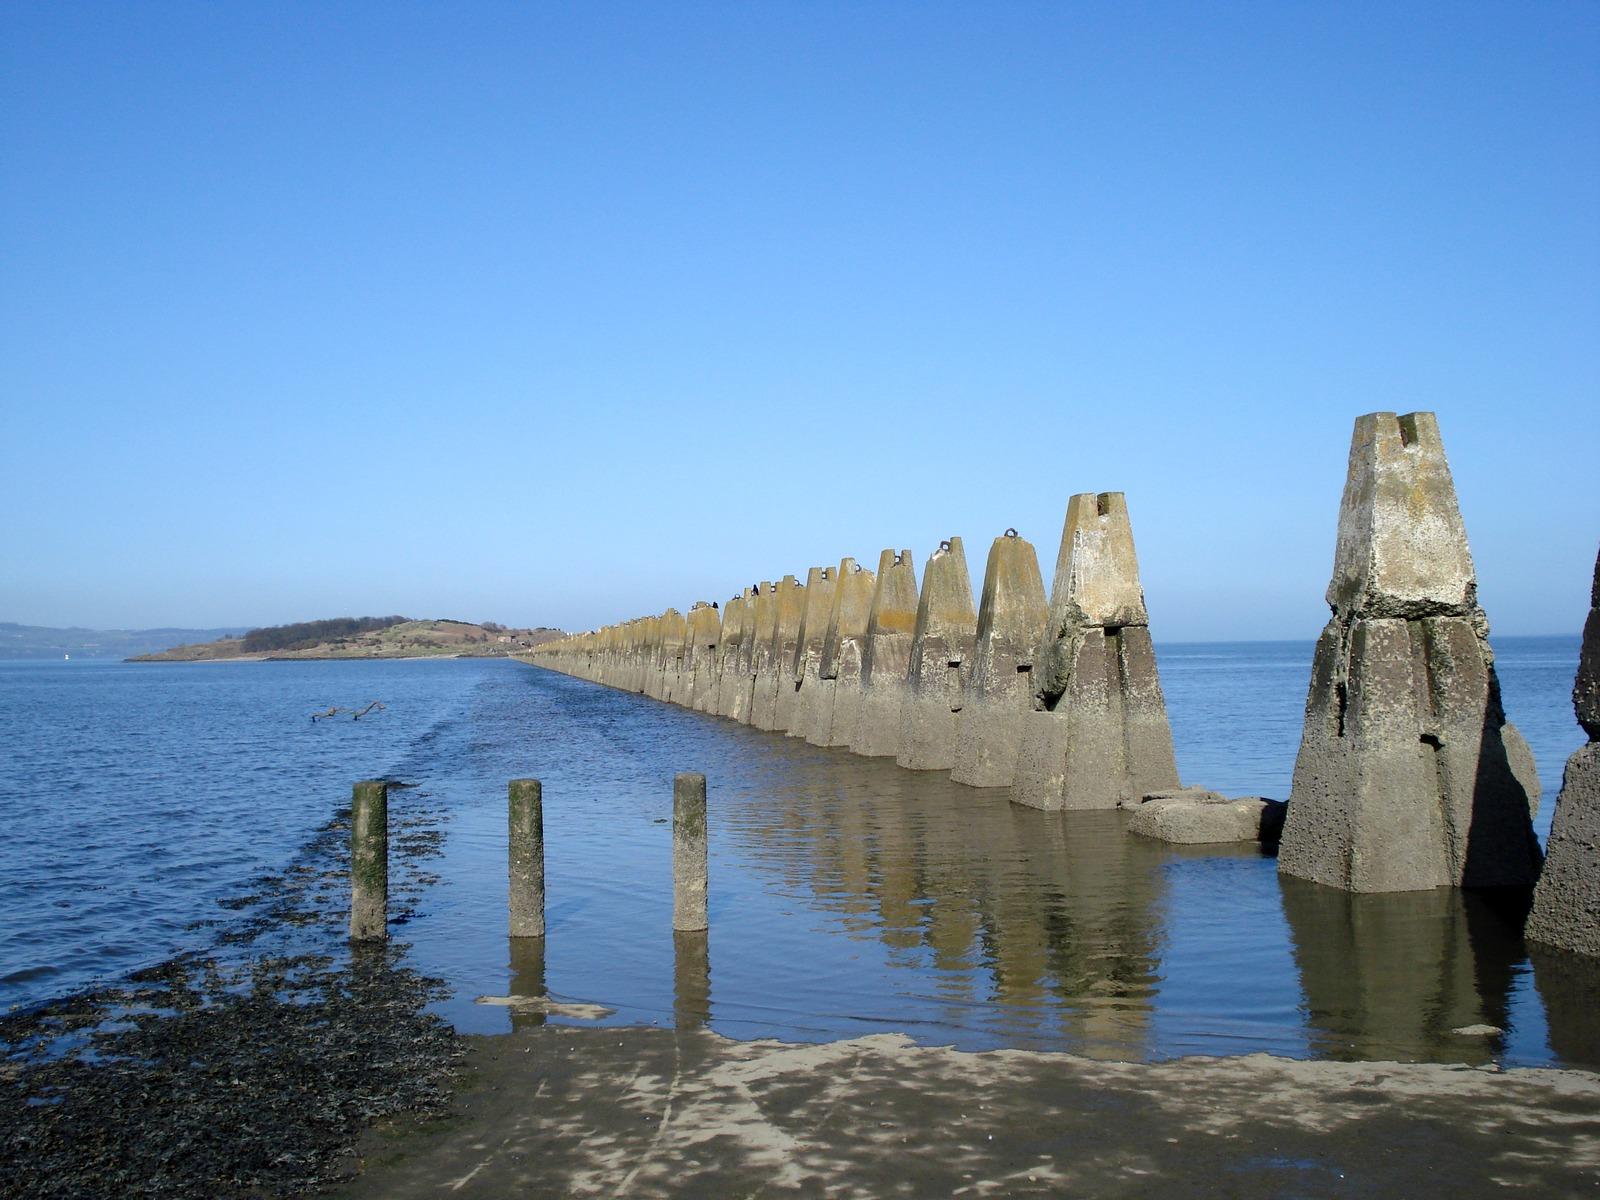 Cramond Island & Causeway